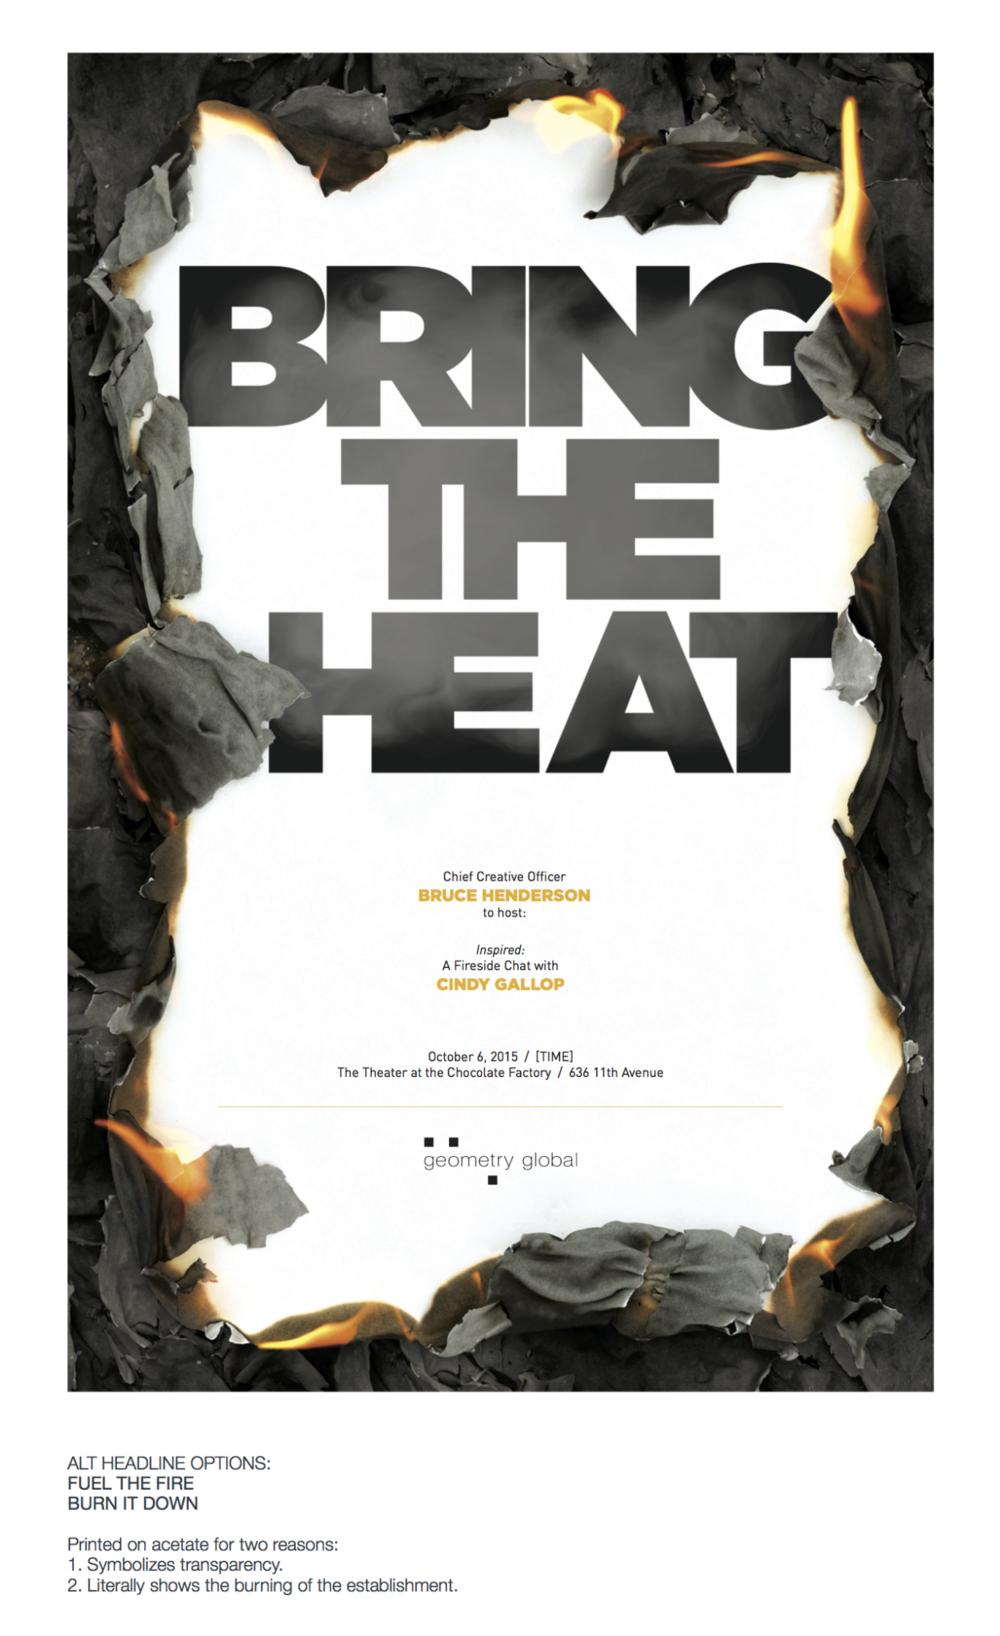 FiresideChat.BringtheHeat